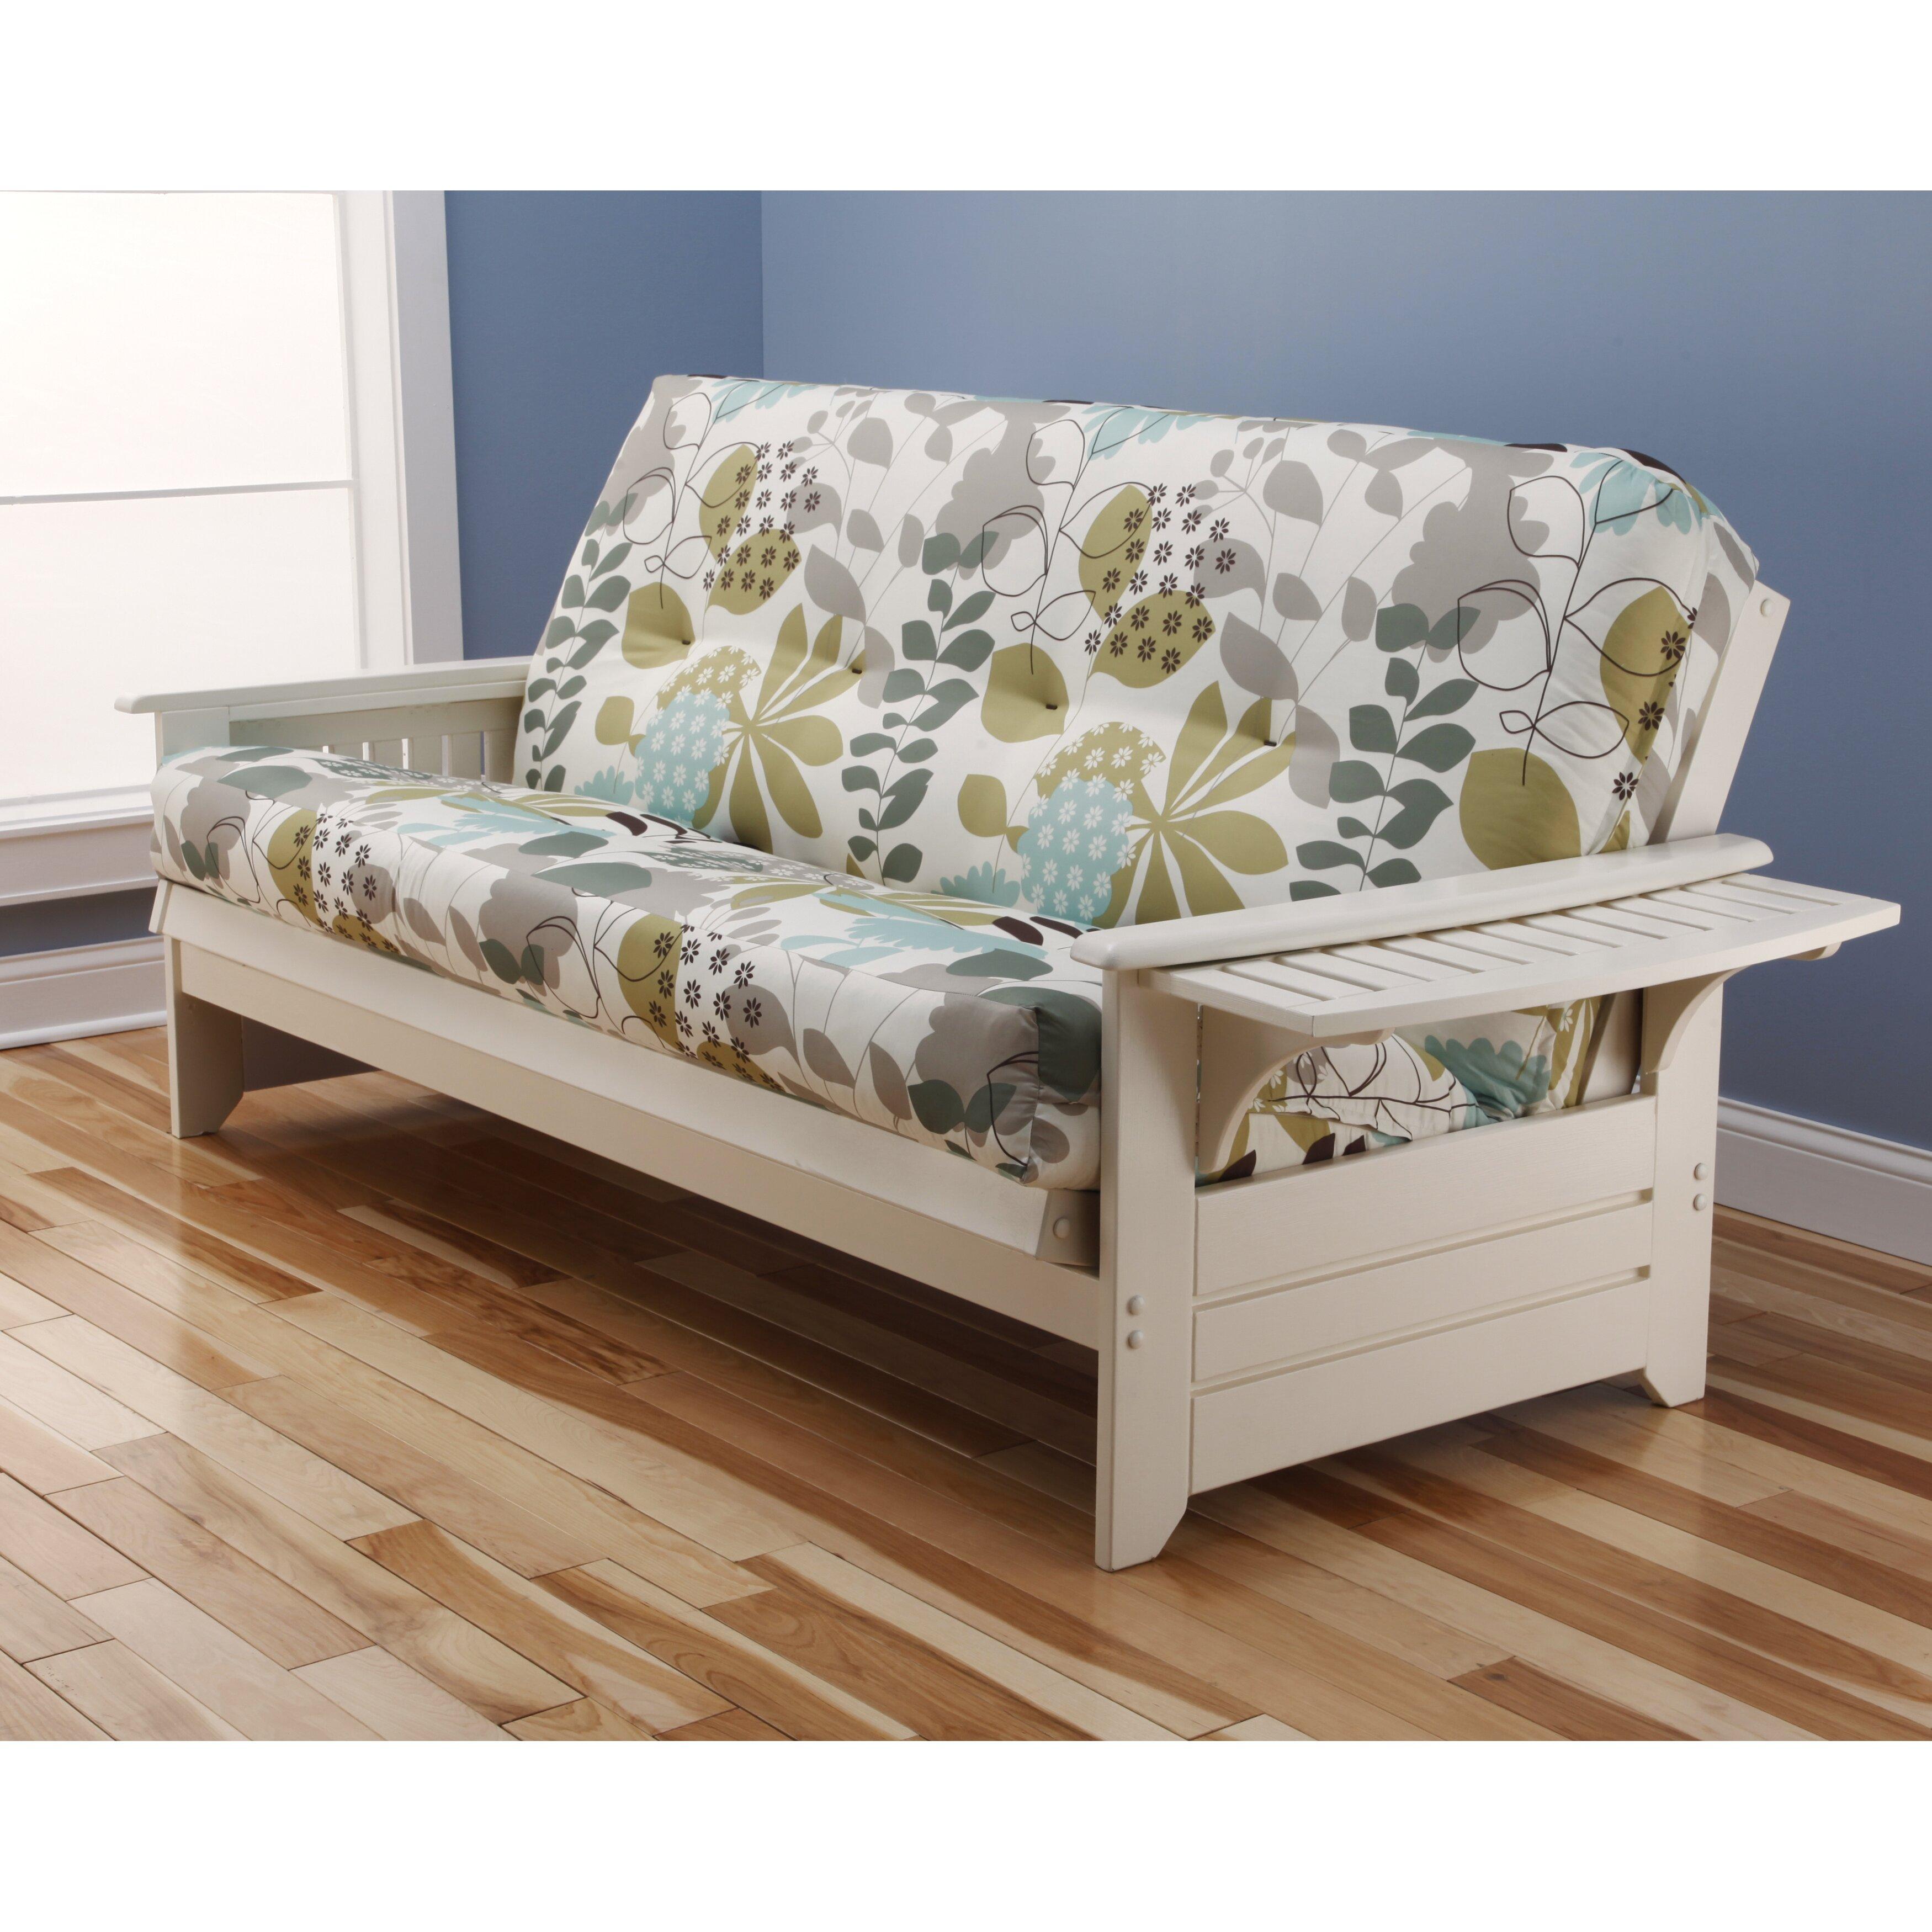 kodiak furniture phoenix english garden futon and mattress